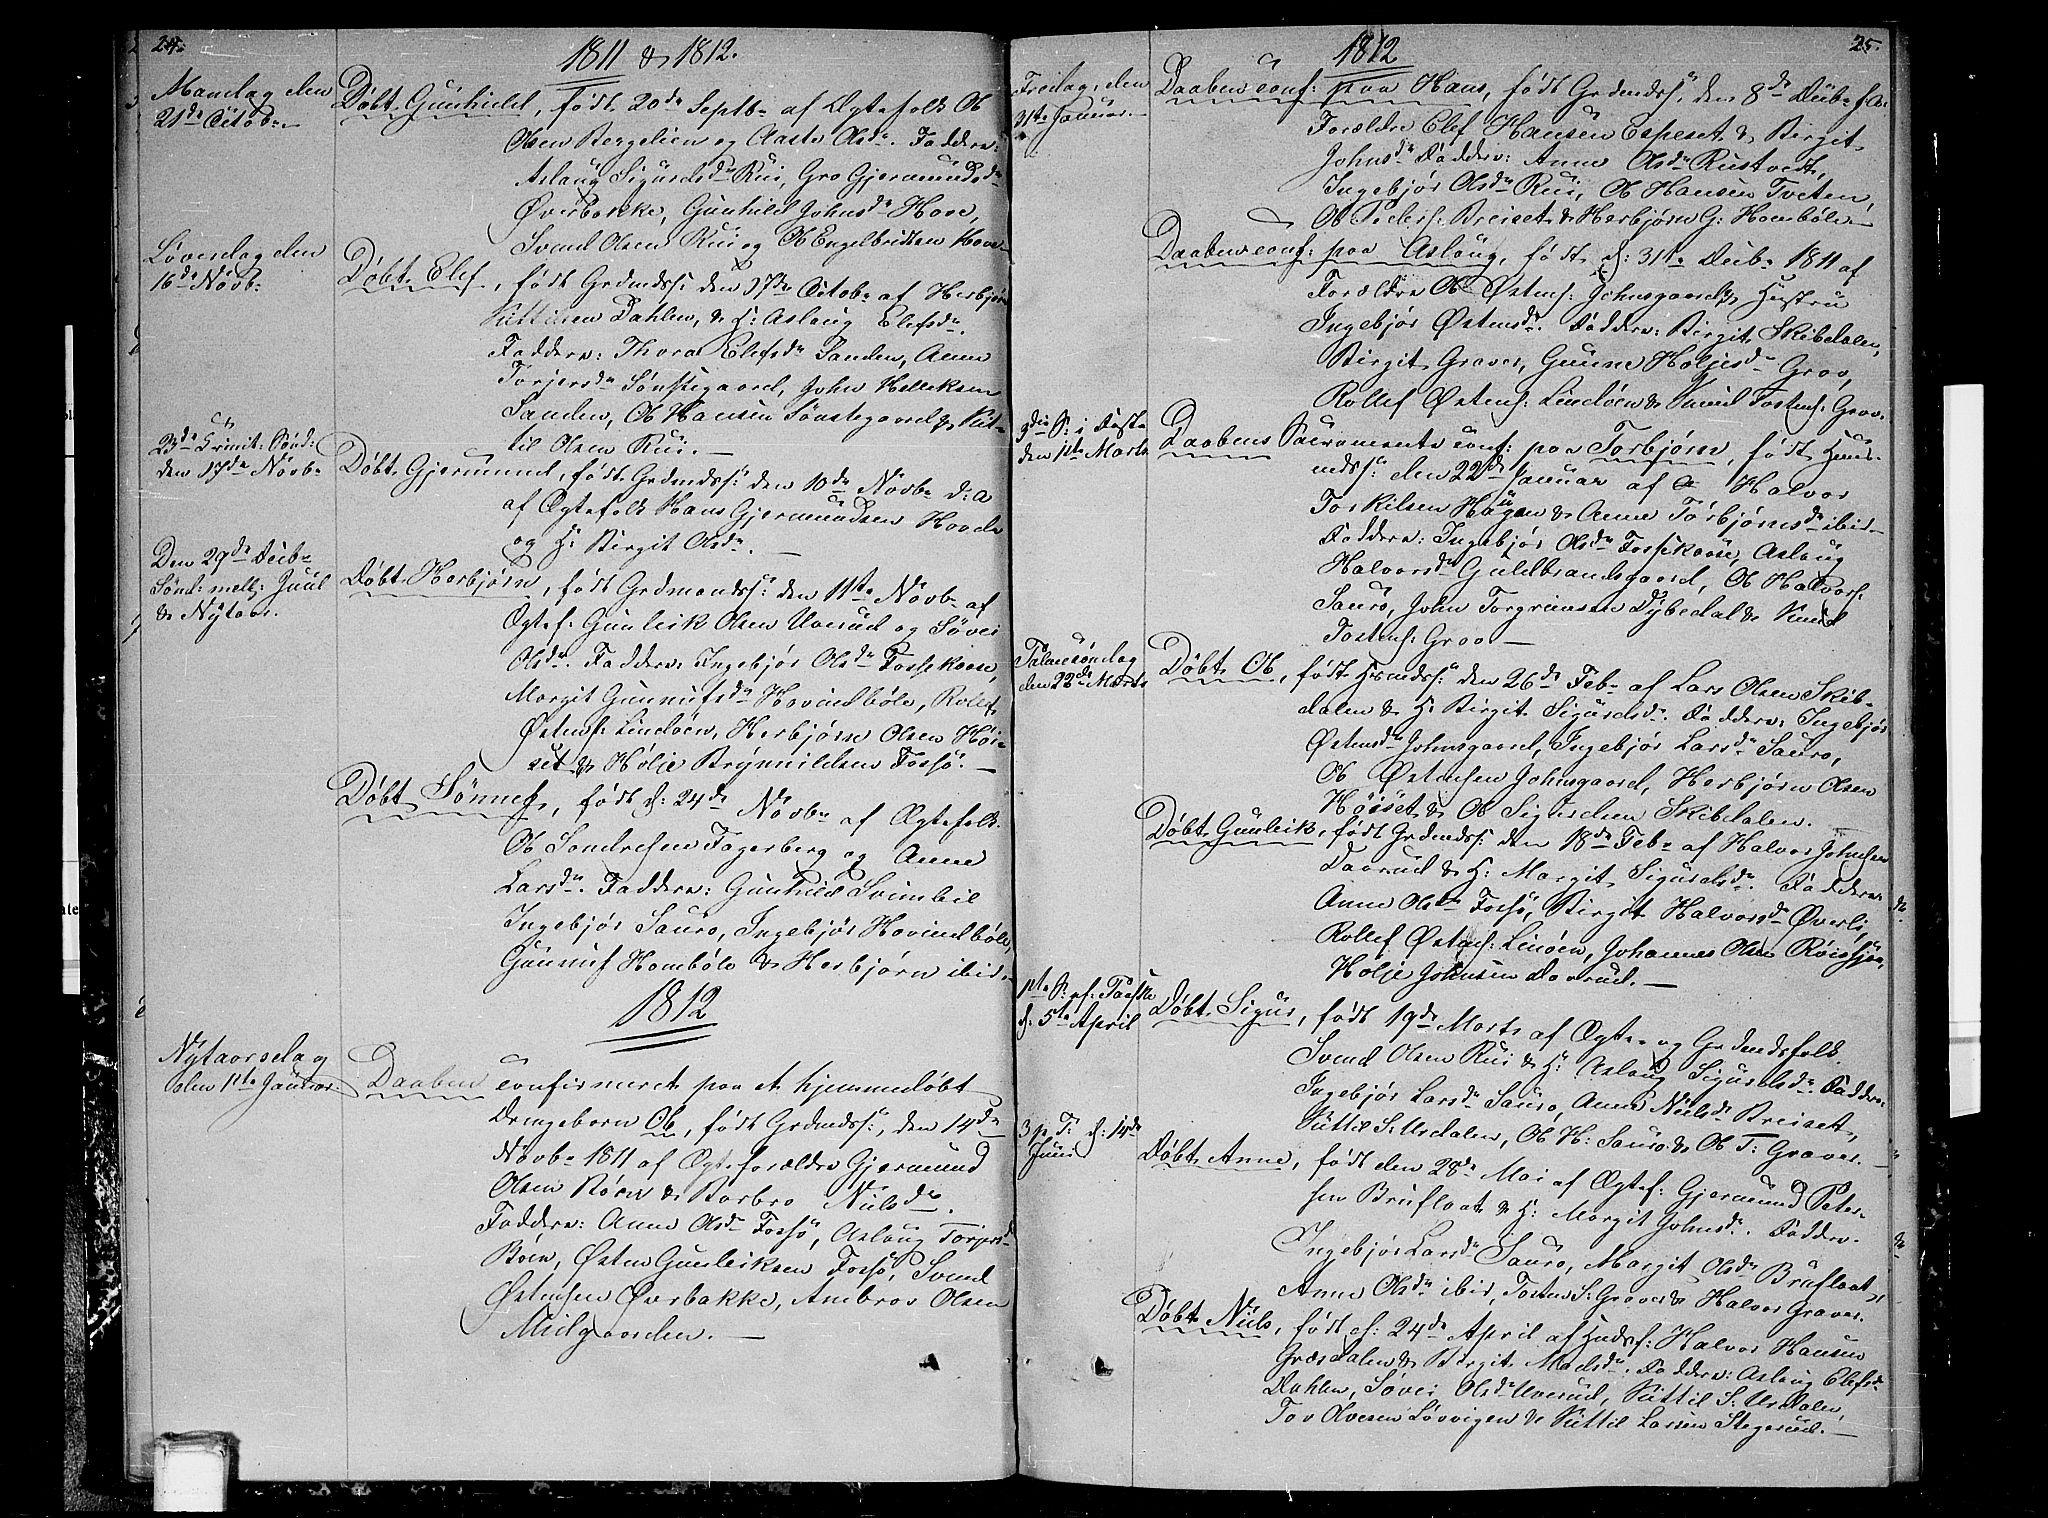 SAKO, Gransherad kirkebøker, F/Fb/L0001: Ministerialbok nr. II 1, 1800-1814, s. 24-25